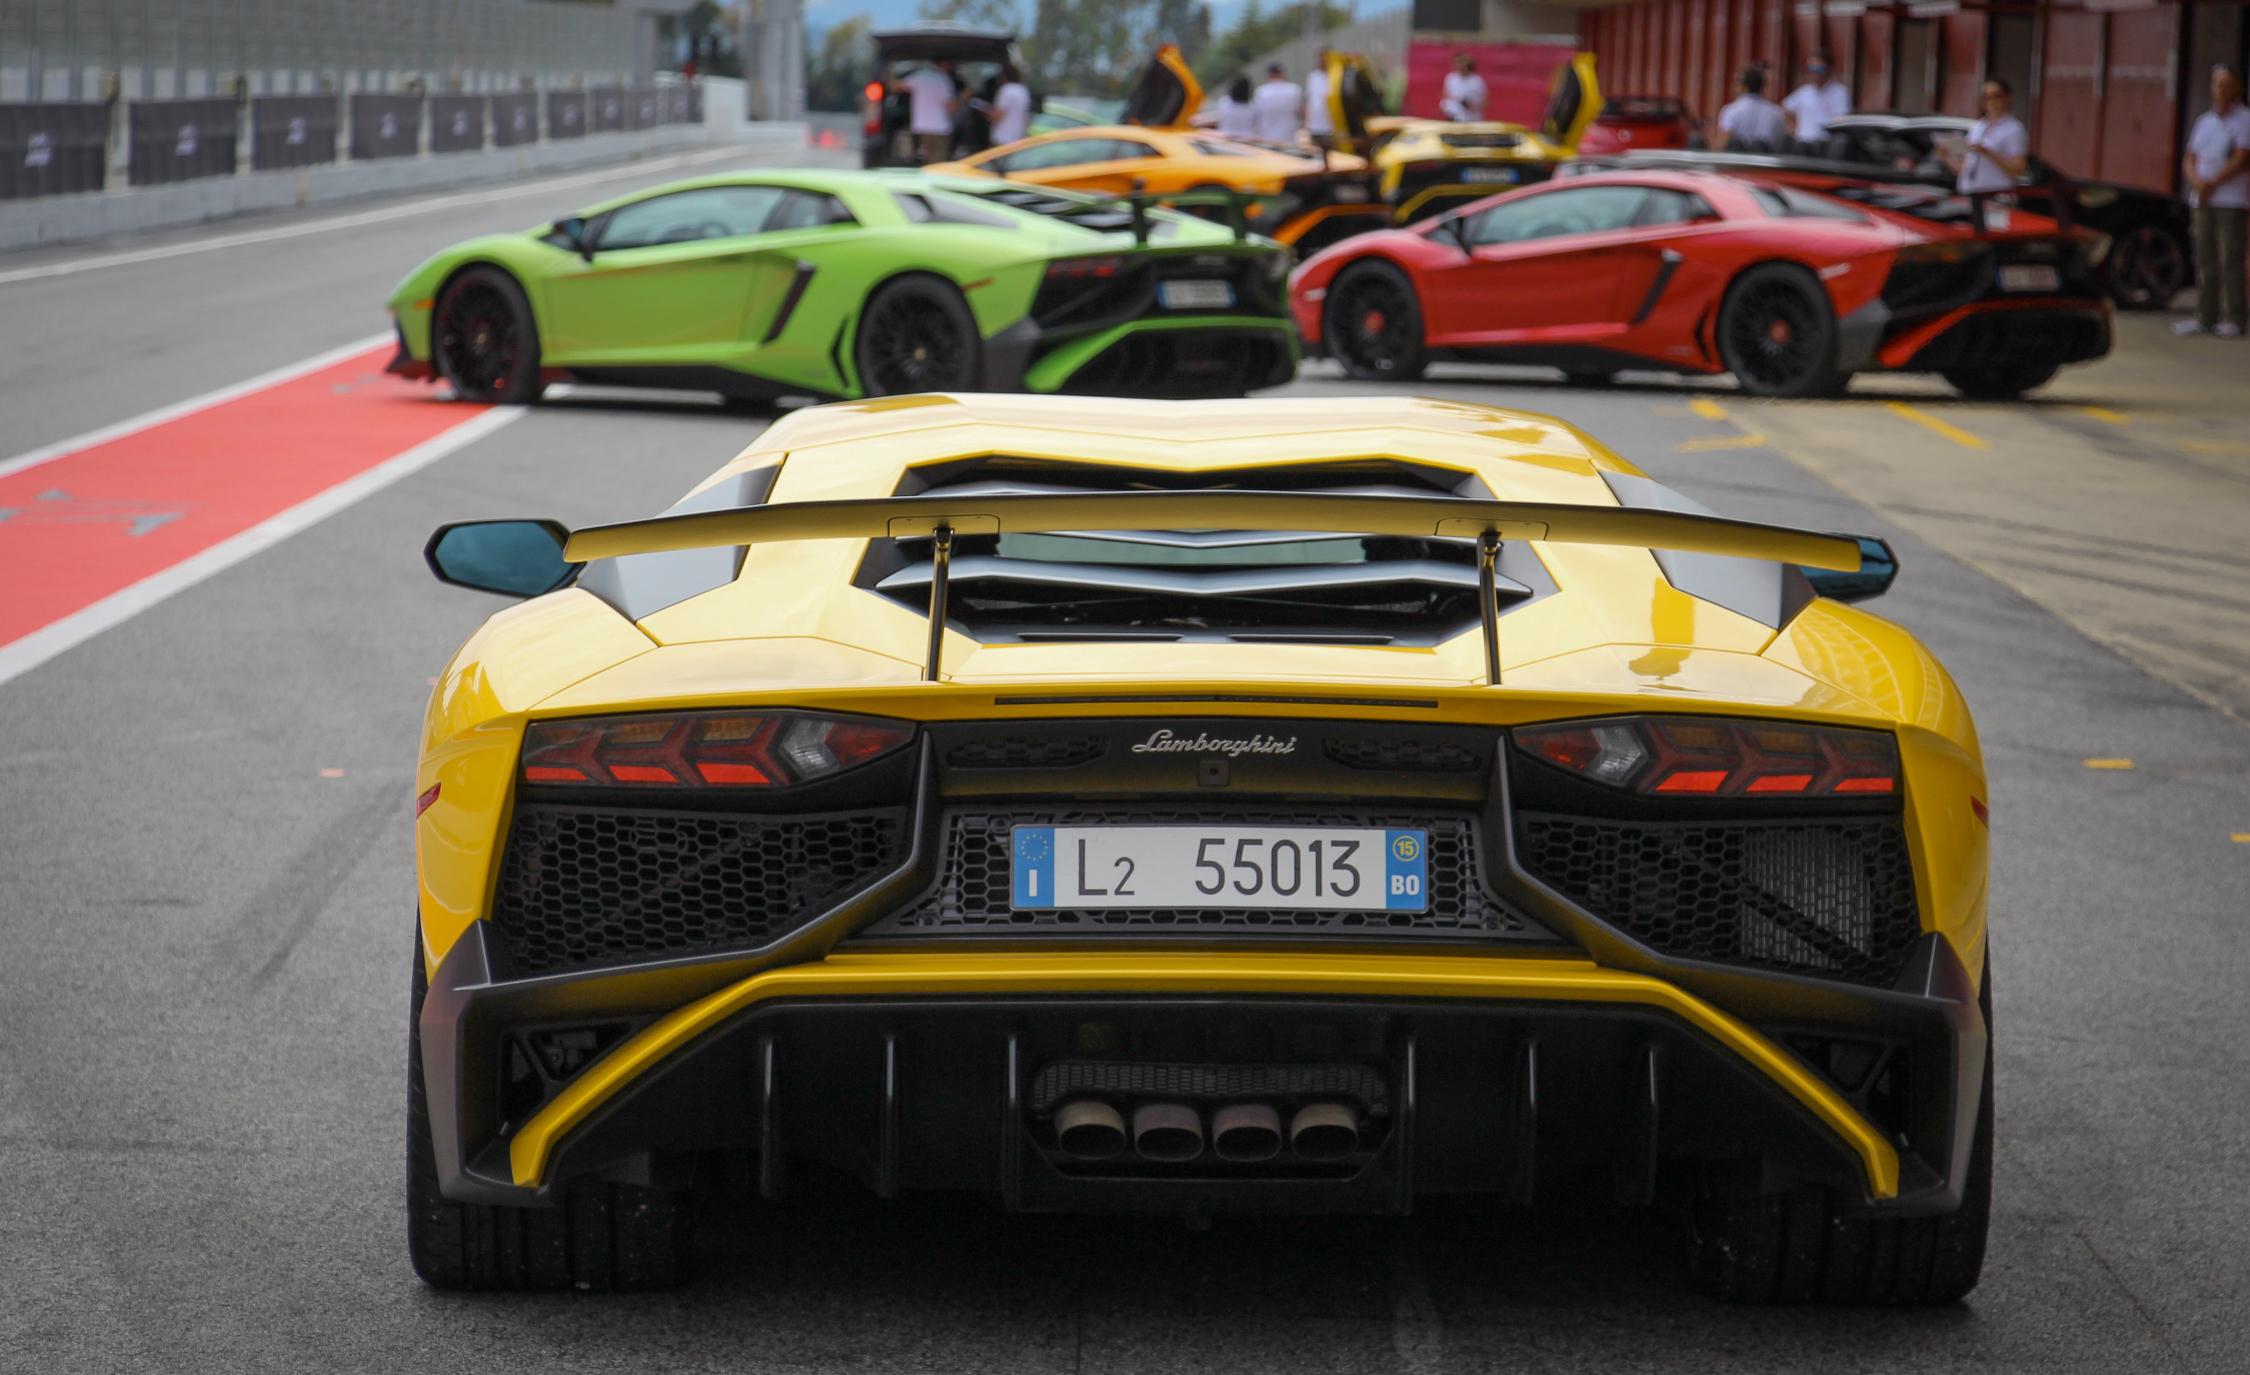 2016 Lamborghini Aventador LP750 4 SV (Photo 20 of 48)